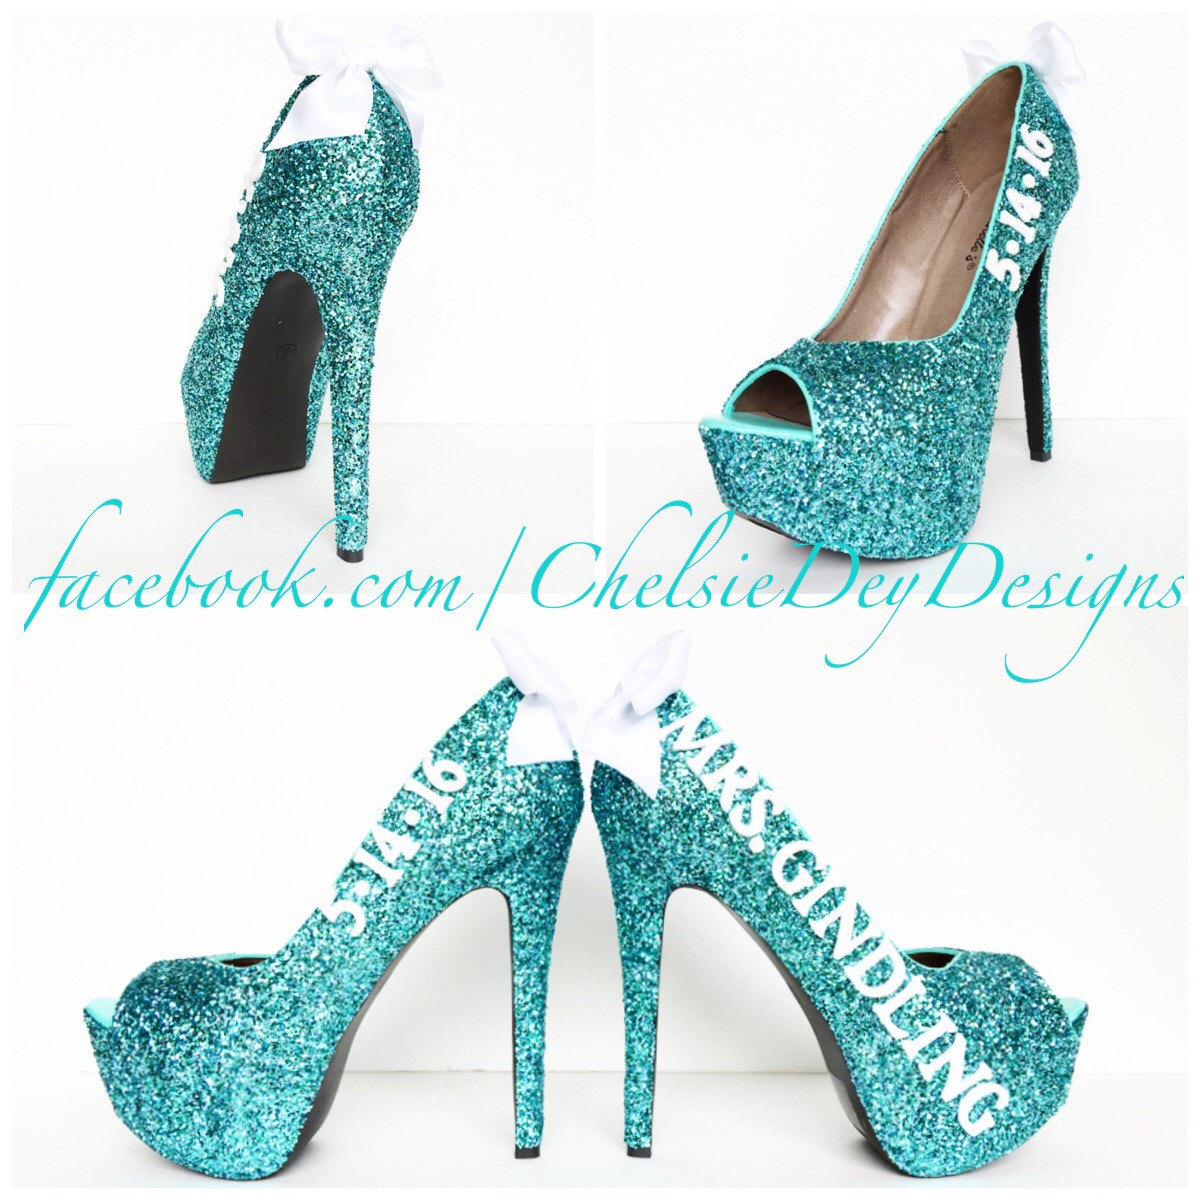 f3a11cca3926 Glitter High Heels - Robins Egg Blue Wedding Date & Name - Open Peep Toe  Pumps